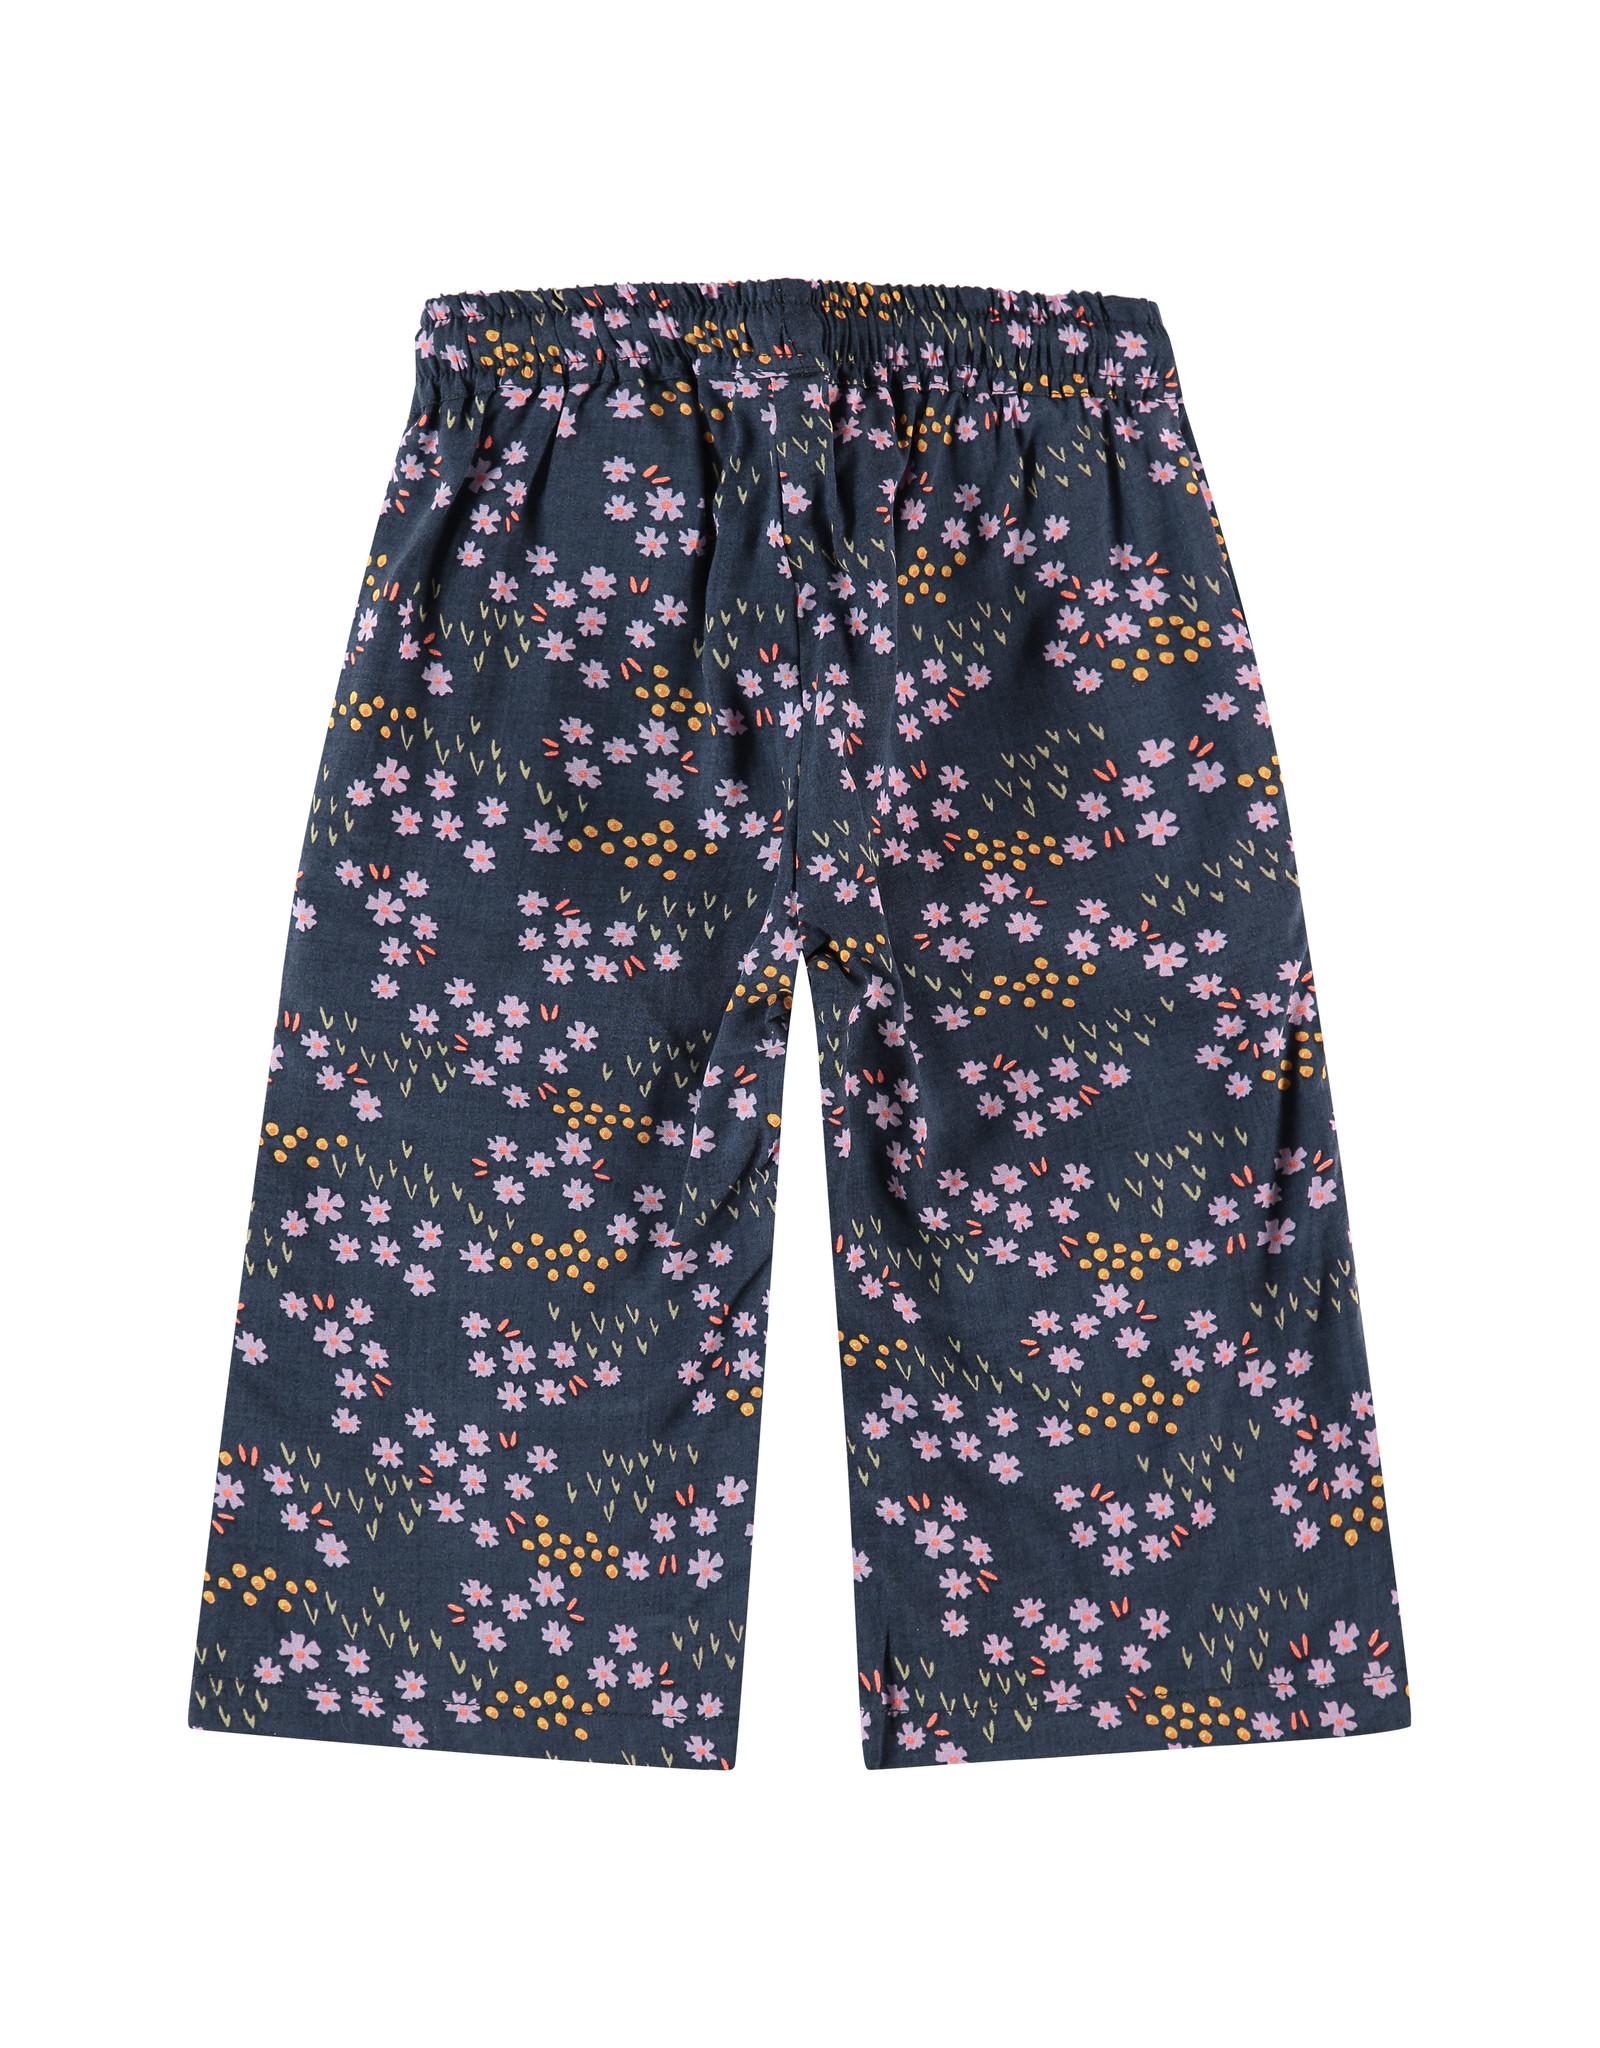 Babyface girls pants, marine, BBE21108224